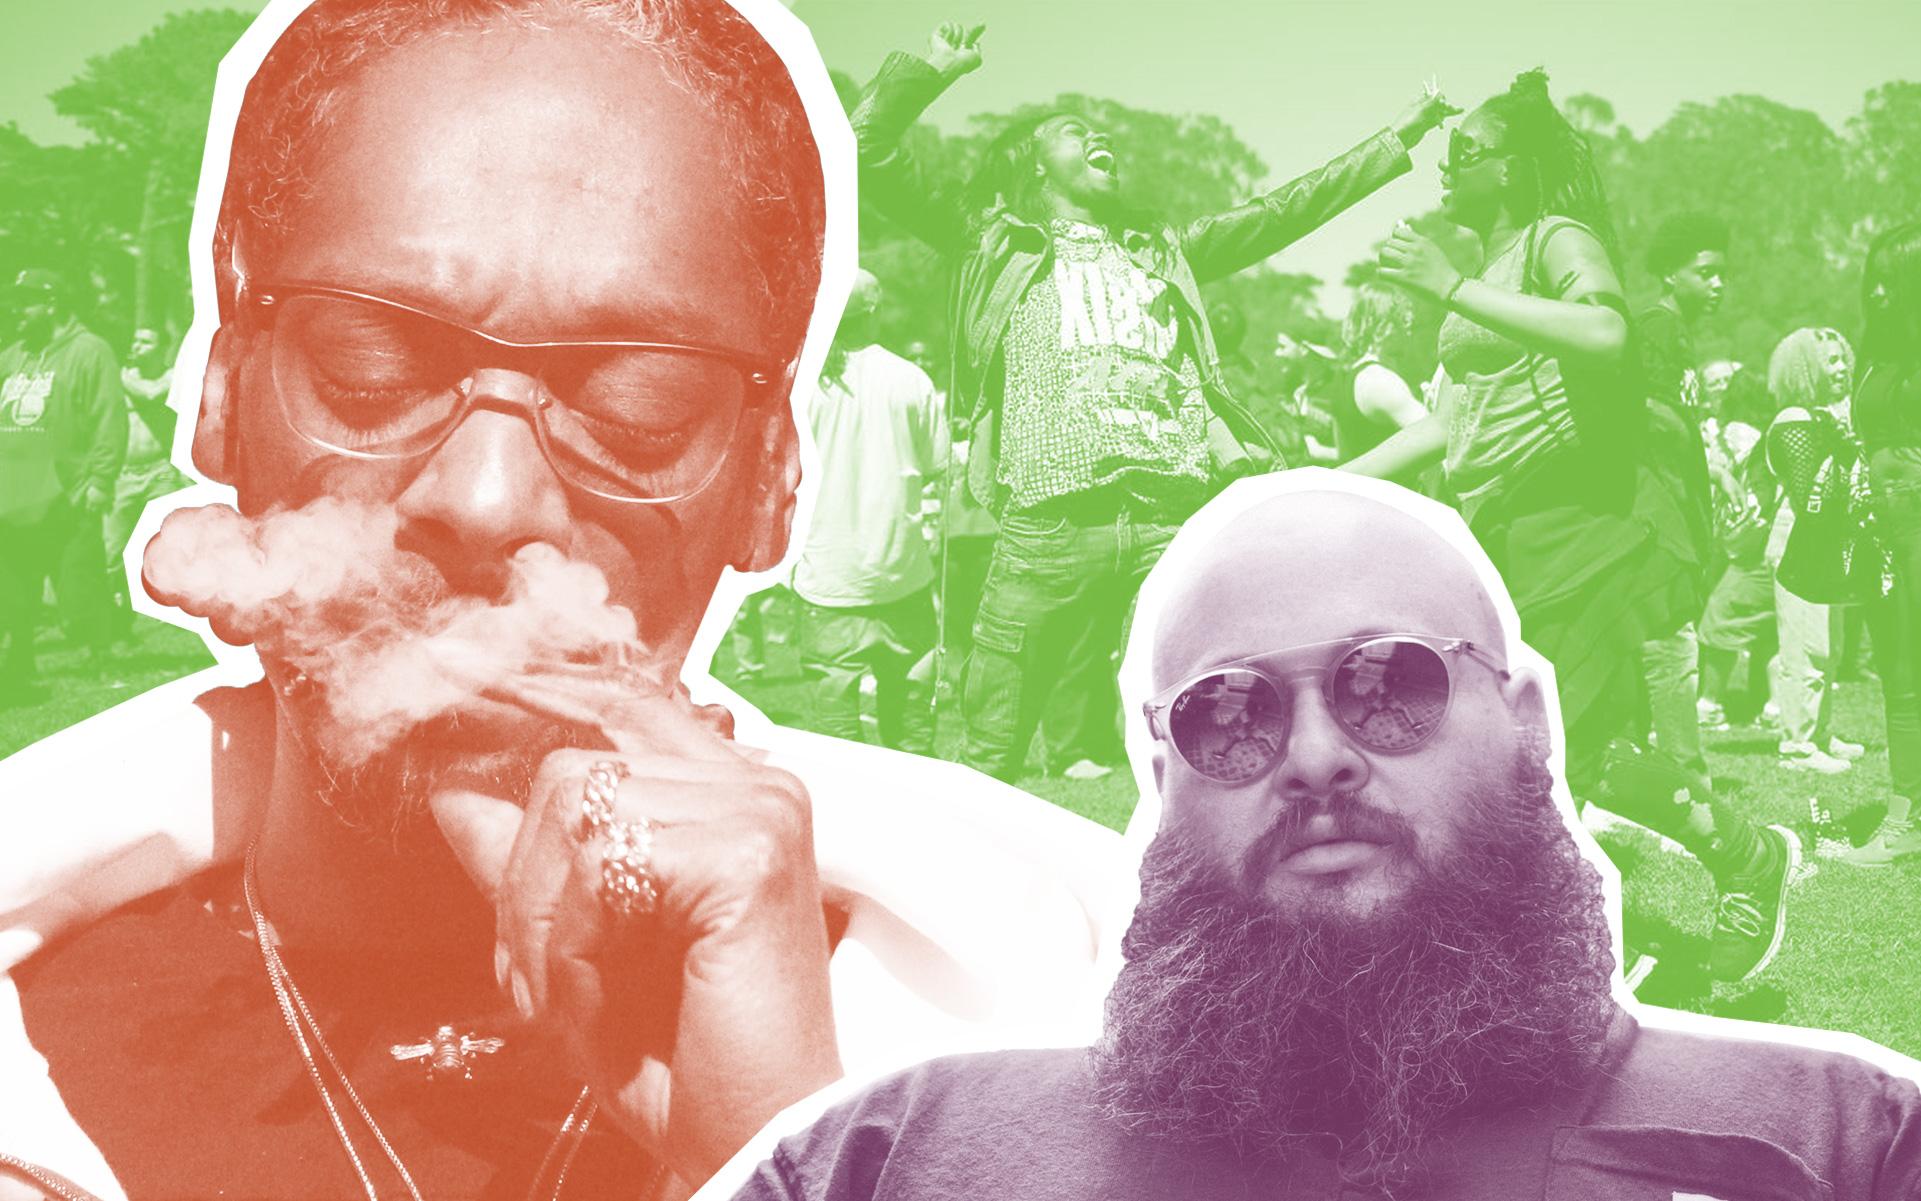 Snoop in Vegas or Action Bronson in DC? America is preparing for its biggest 420 yet. (AP, Courtesy of Action Bronson, Courtesy of Green Rush)